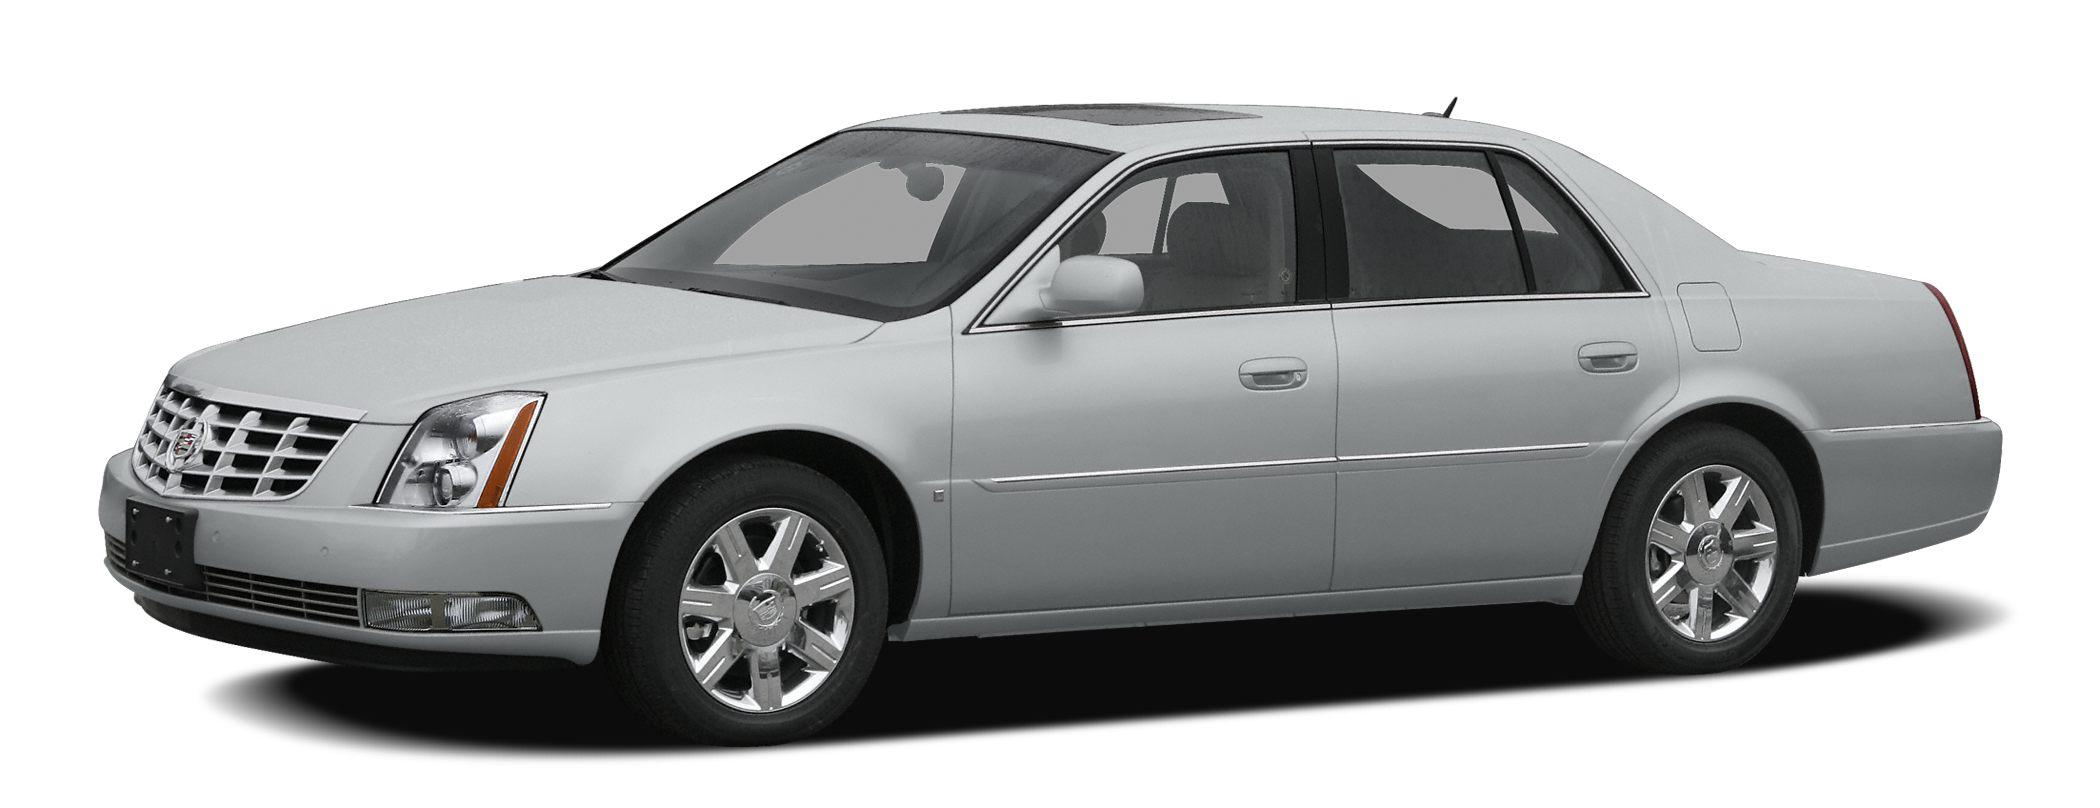 2010 Cadillac DTS  Miles 62311Color Silver Stock 17167 VIN 1G6KA5EY5AU124635